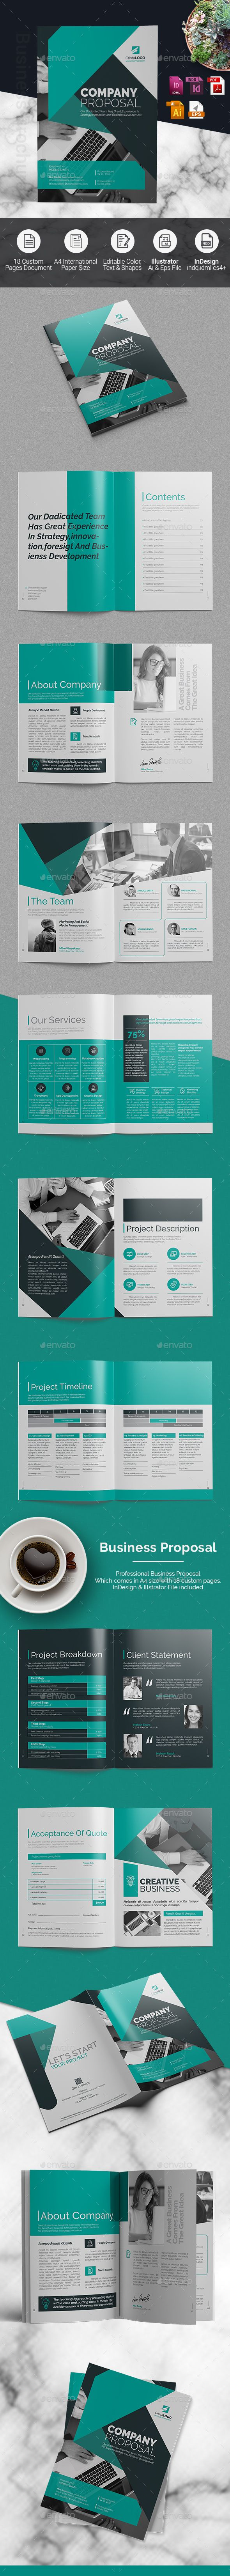 Business Proposal — Vector EPS #brochure design #minimal • Download ➝ https://graphicriver.net/item/business-proposal/20166674?ref=pxcr